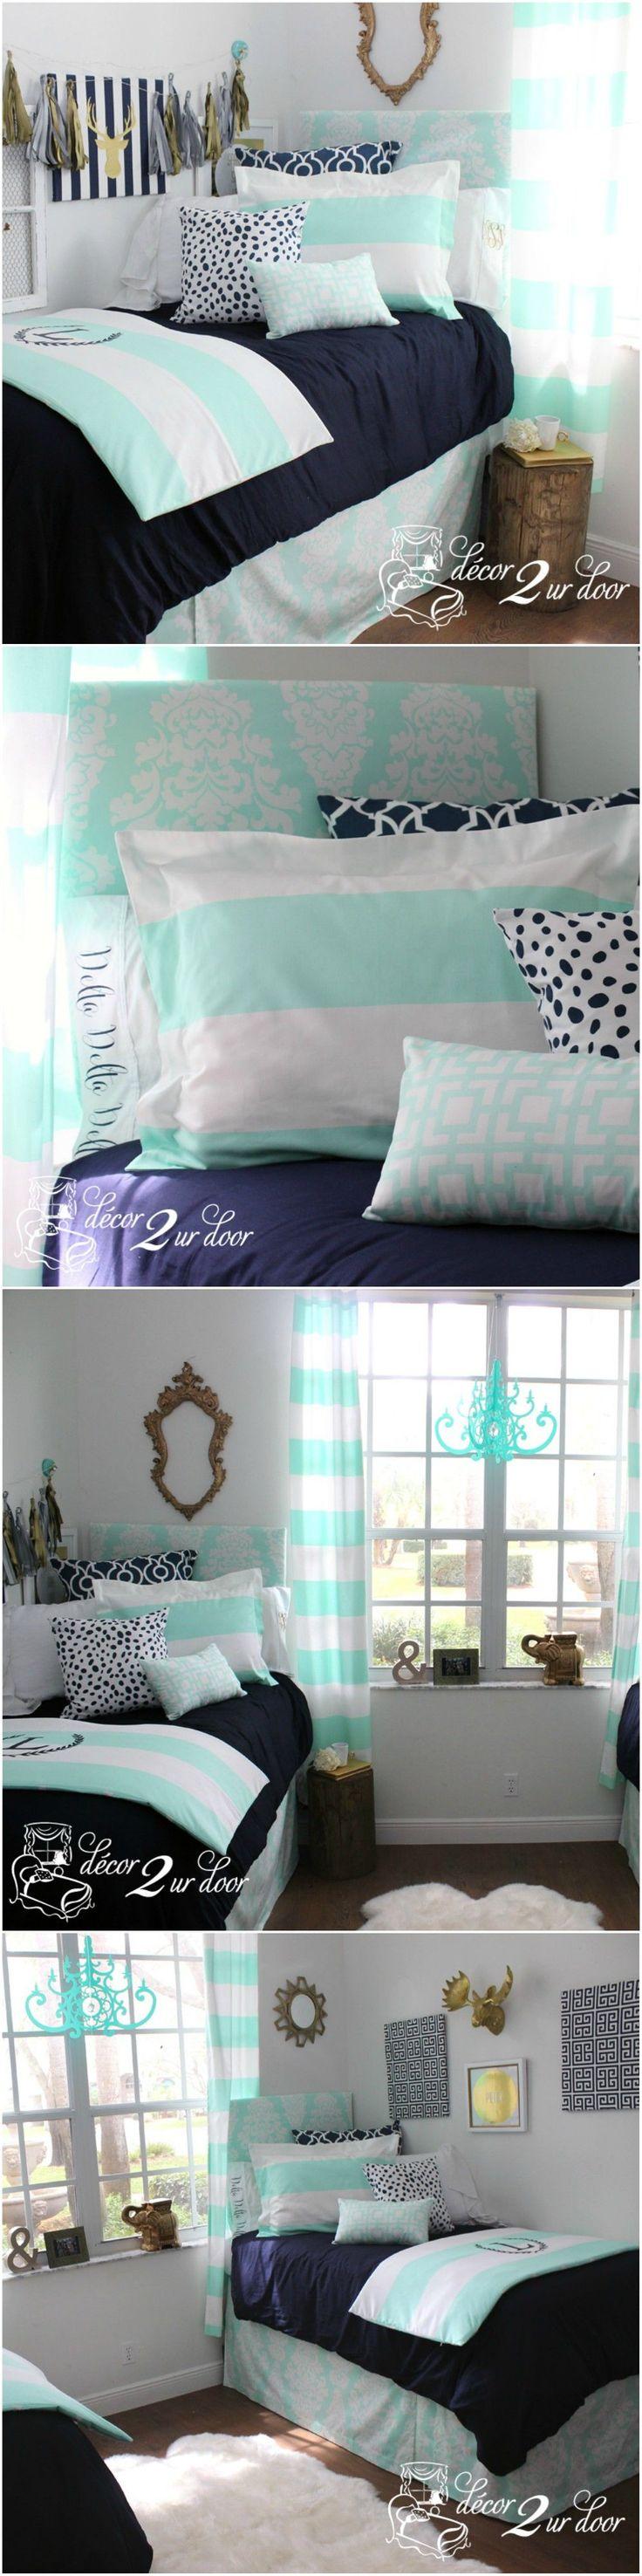 Best 25+ Mint rooms ideas on Pinterest | Bedroom mint, Mint green ...